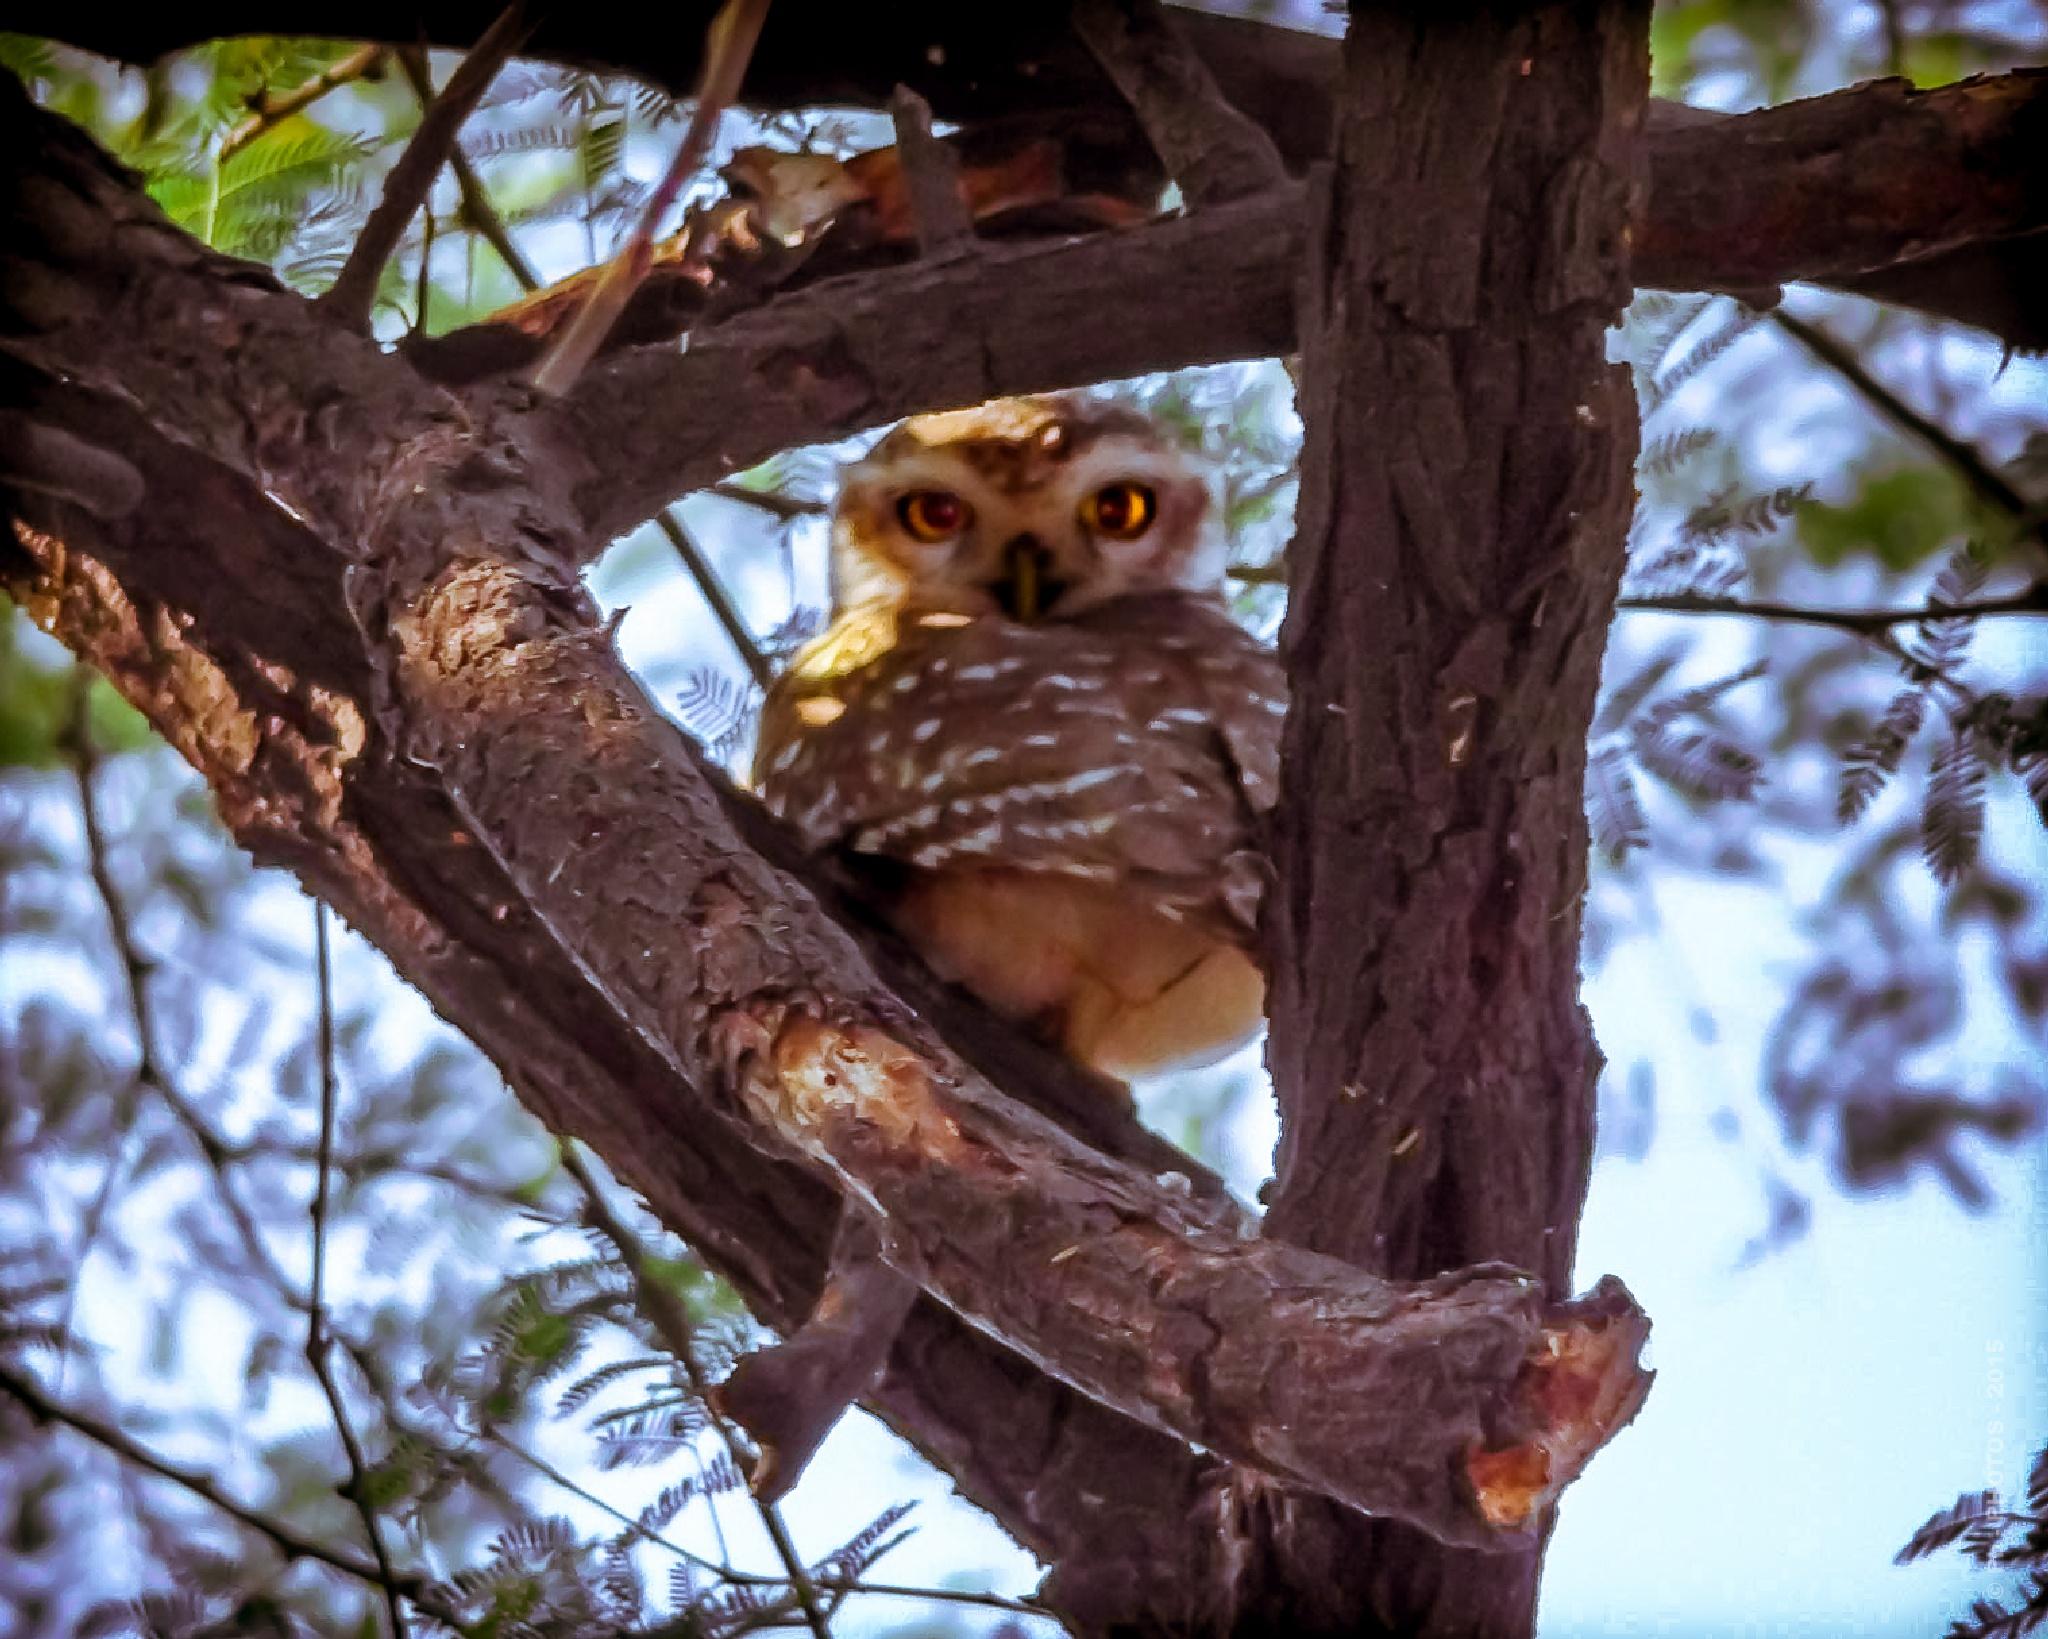 365 - Portrait of an Owl - Animal by Pb - PHOTOS